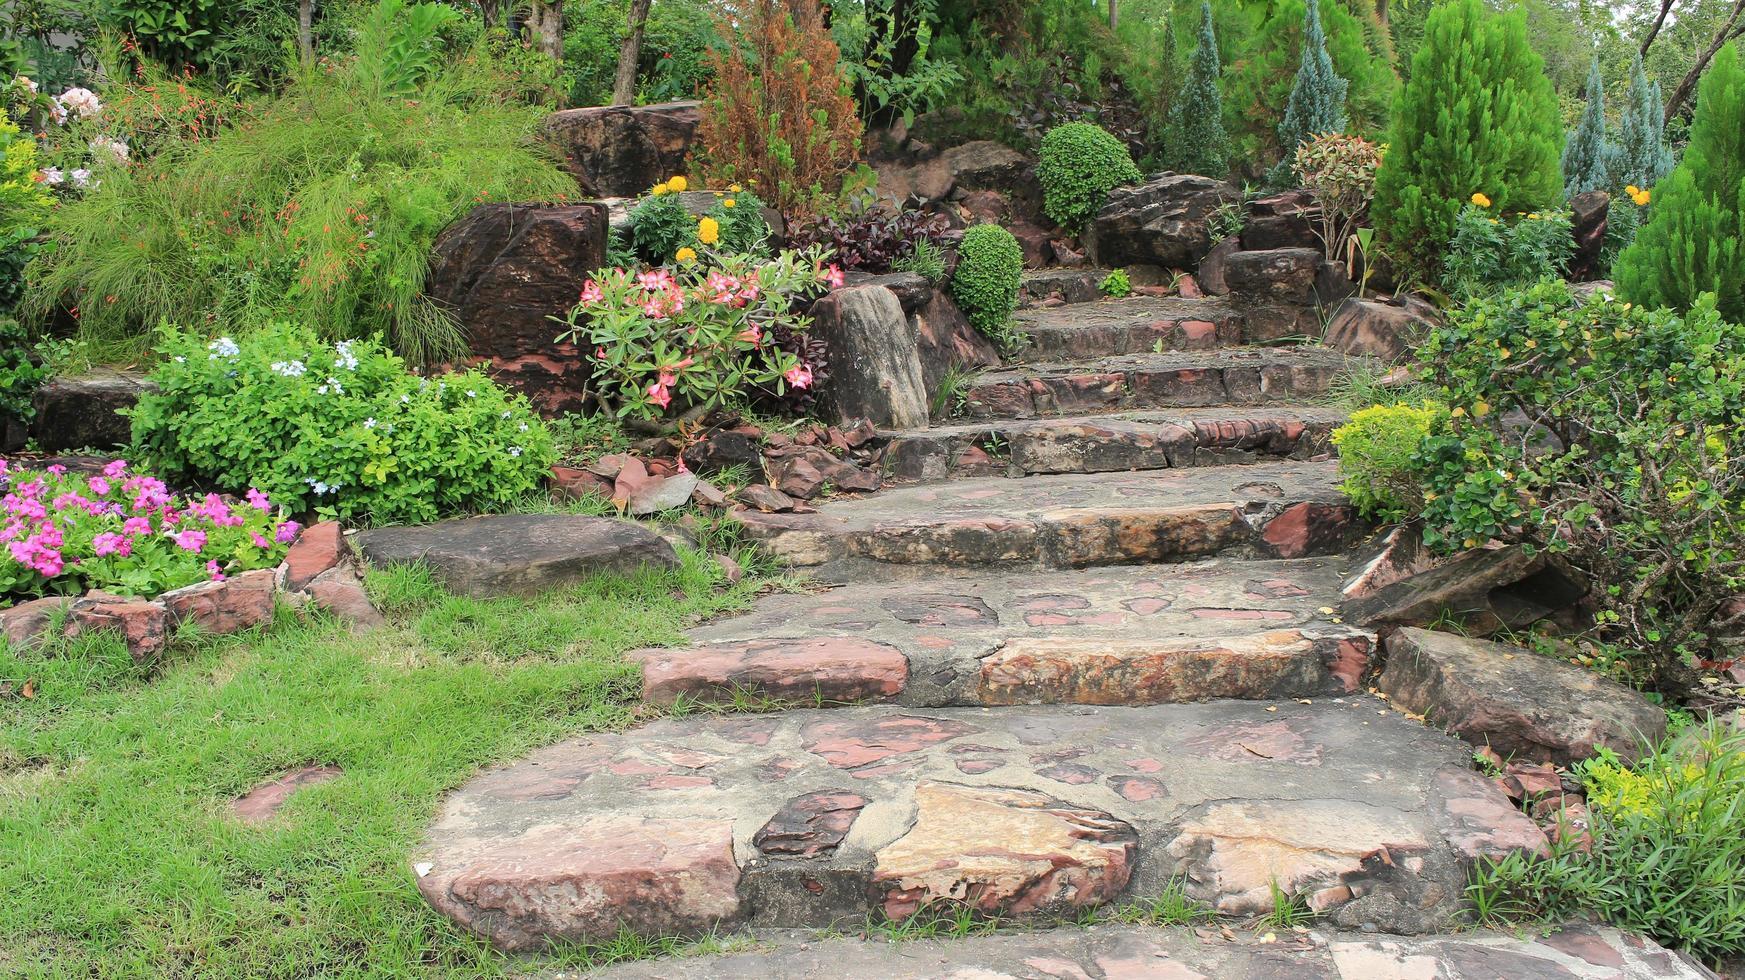 escalier en pierre dans un jardin photo